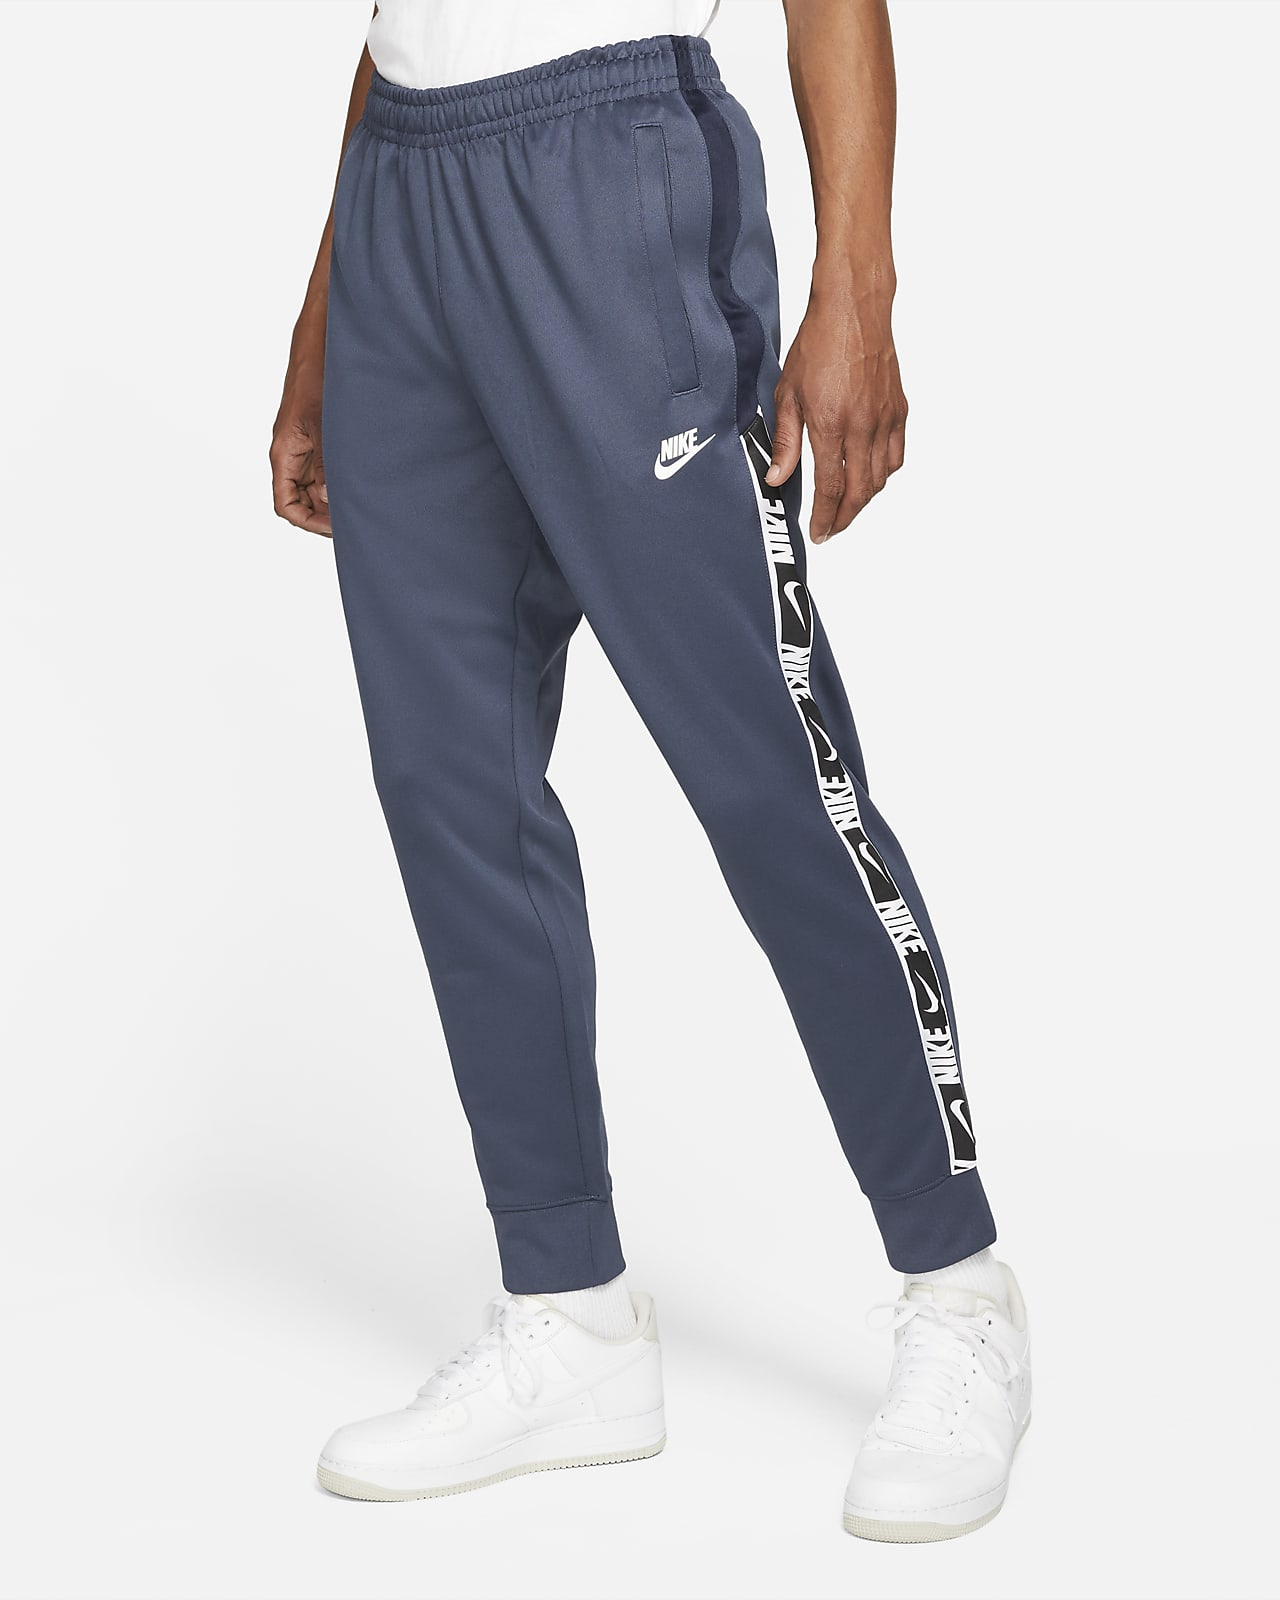 Pantaloni jogger Nike Sportswear - Uomo